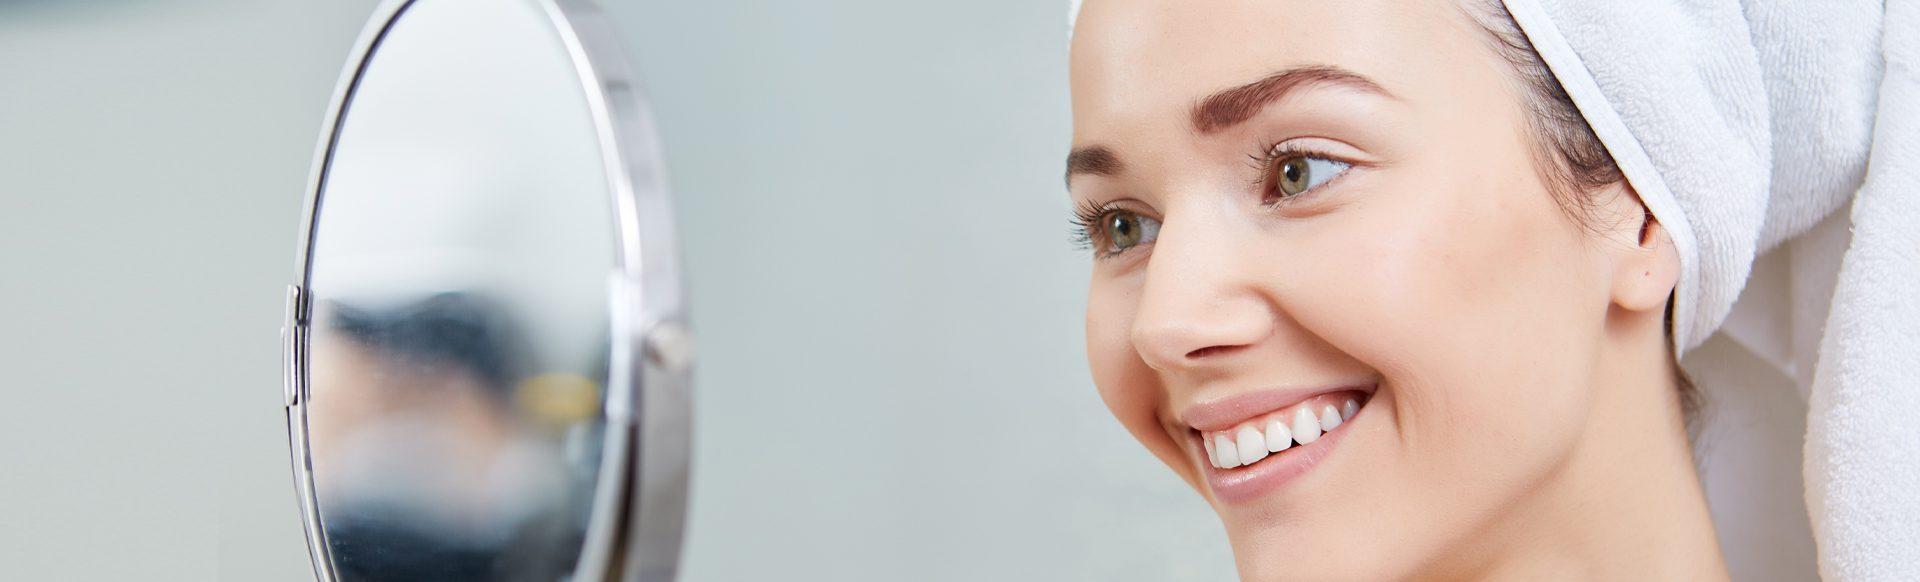 Innovative-Aesthetics-Services-main-Acne-BBL